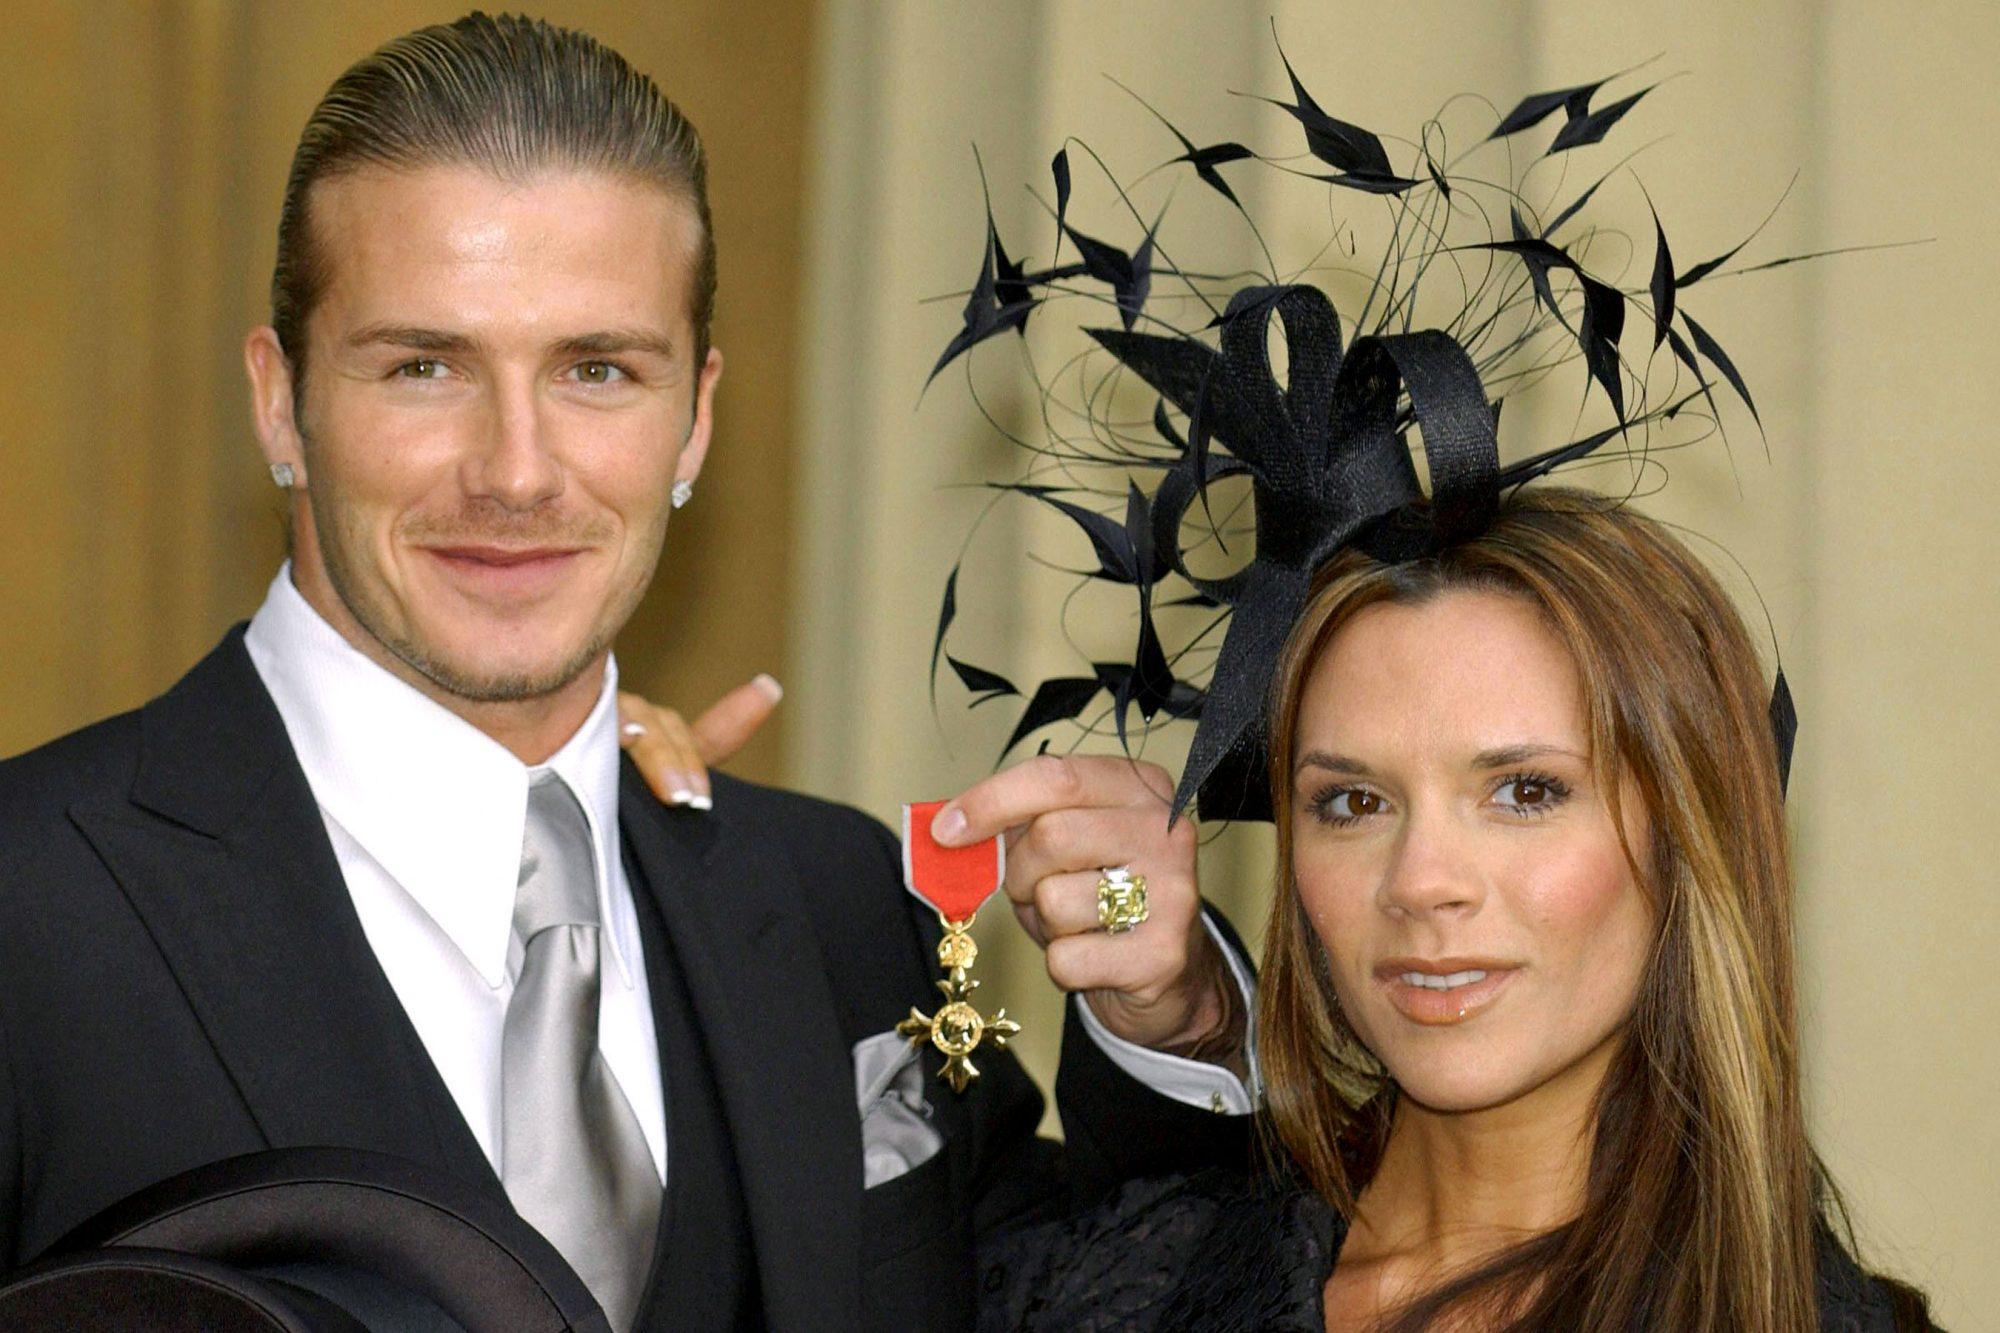 England's football captain David Beckham